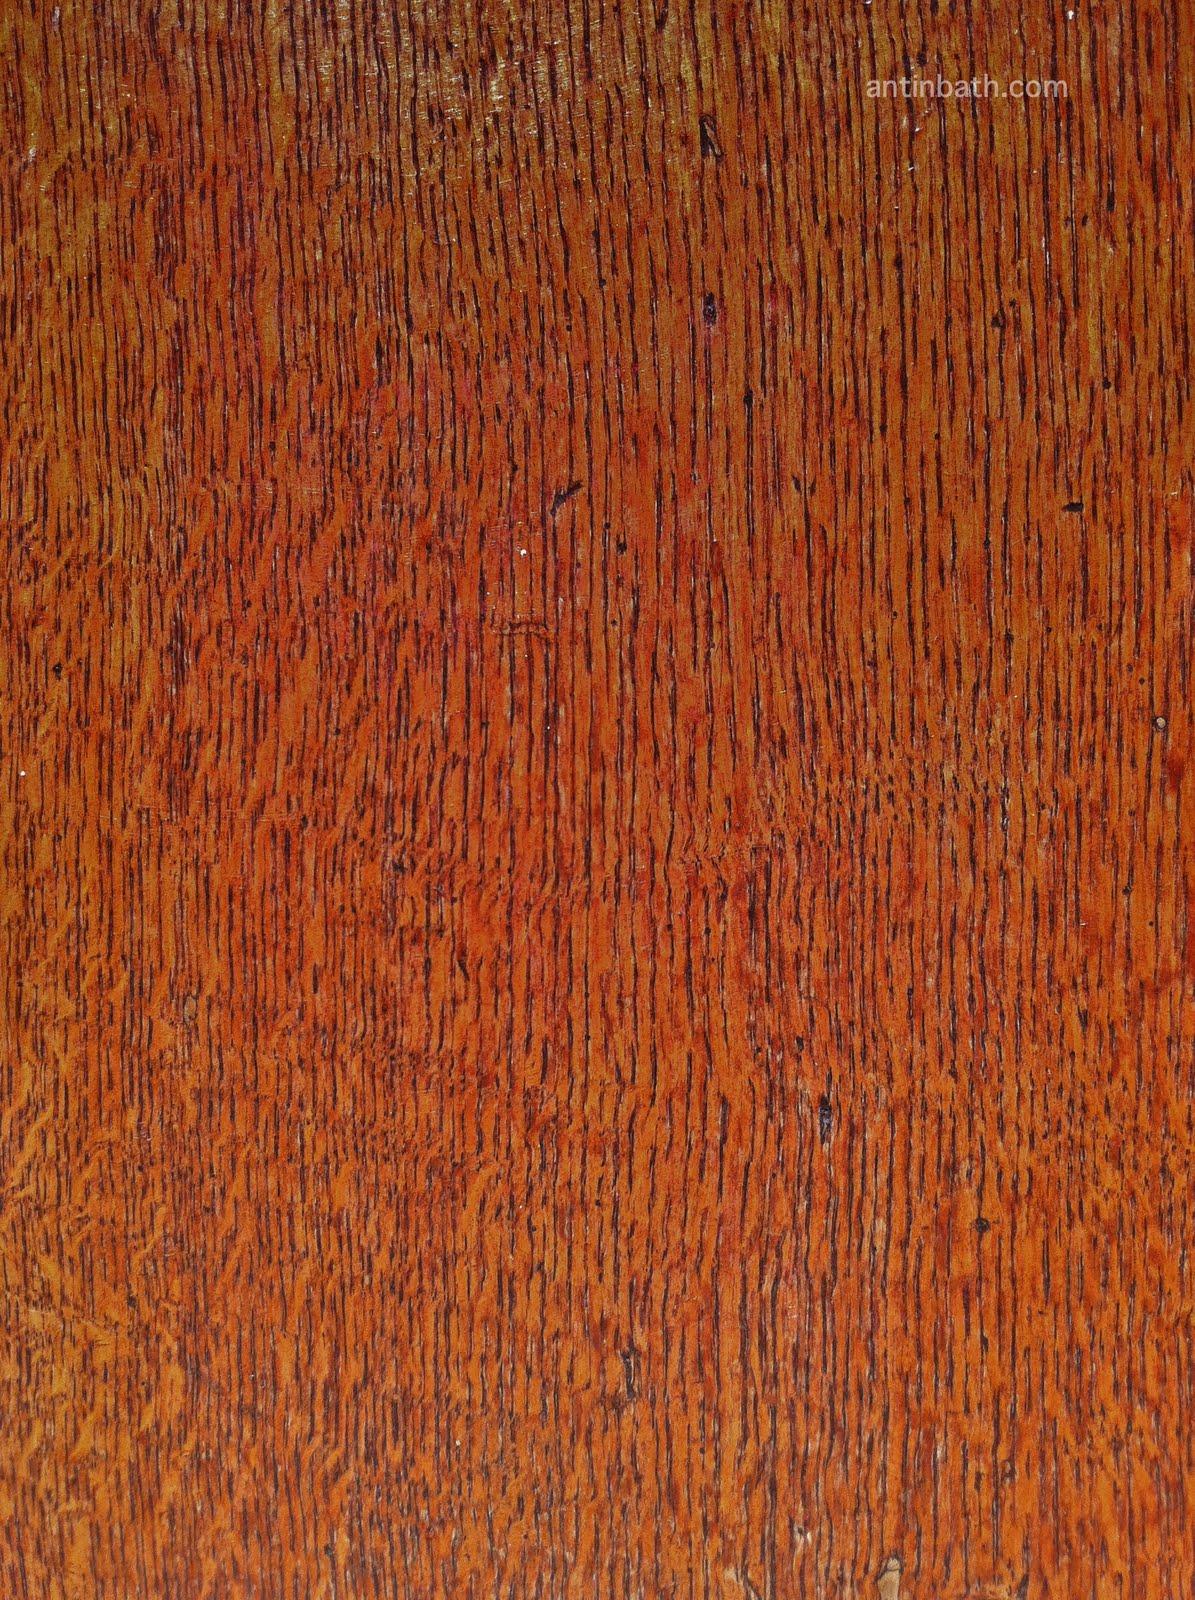 http://2.bp.blogspot.com/_BWeFvHW8_hE/TCphBUMUl0I/AAAAAAAAAdY/q6m27yUGz2E/s1600/antinbath-free-iphone4-wallpaper-5.jpg